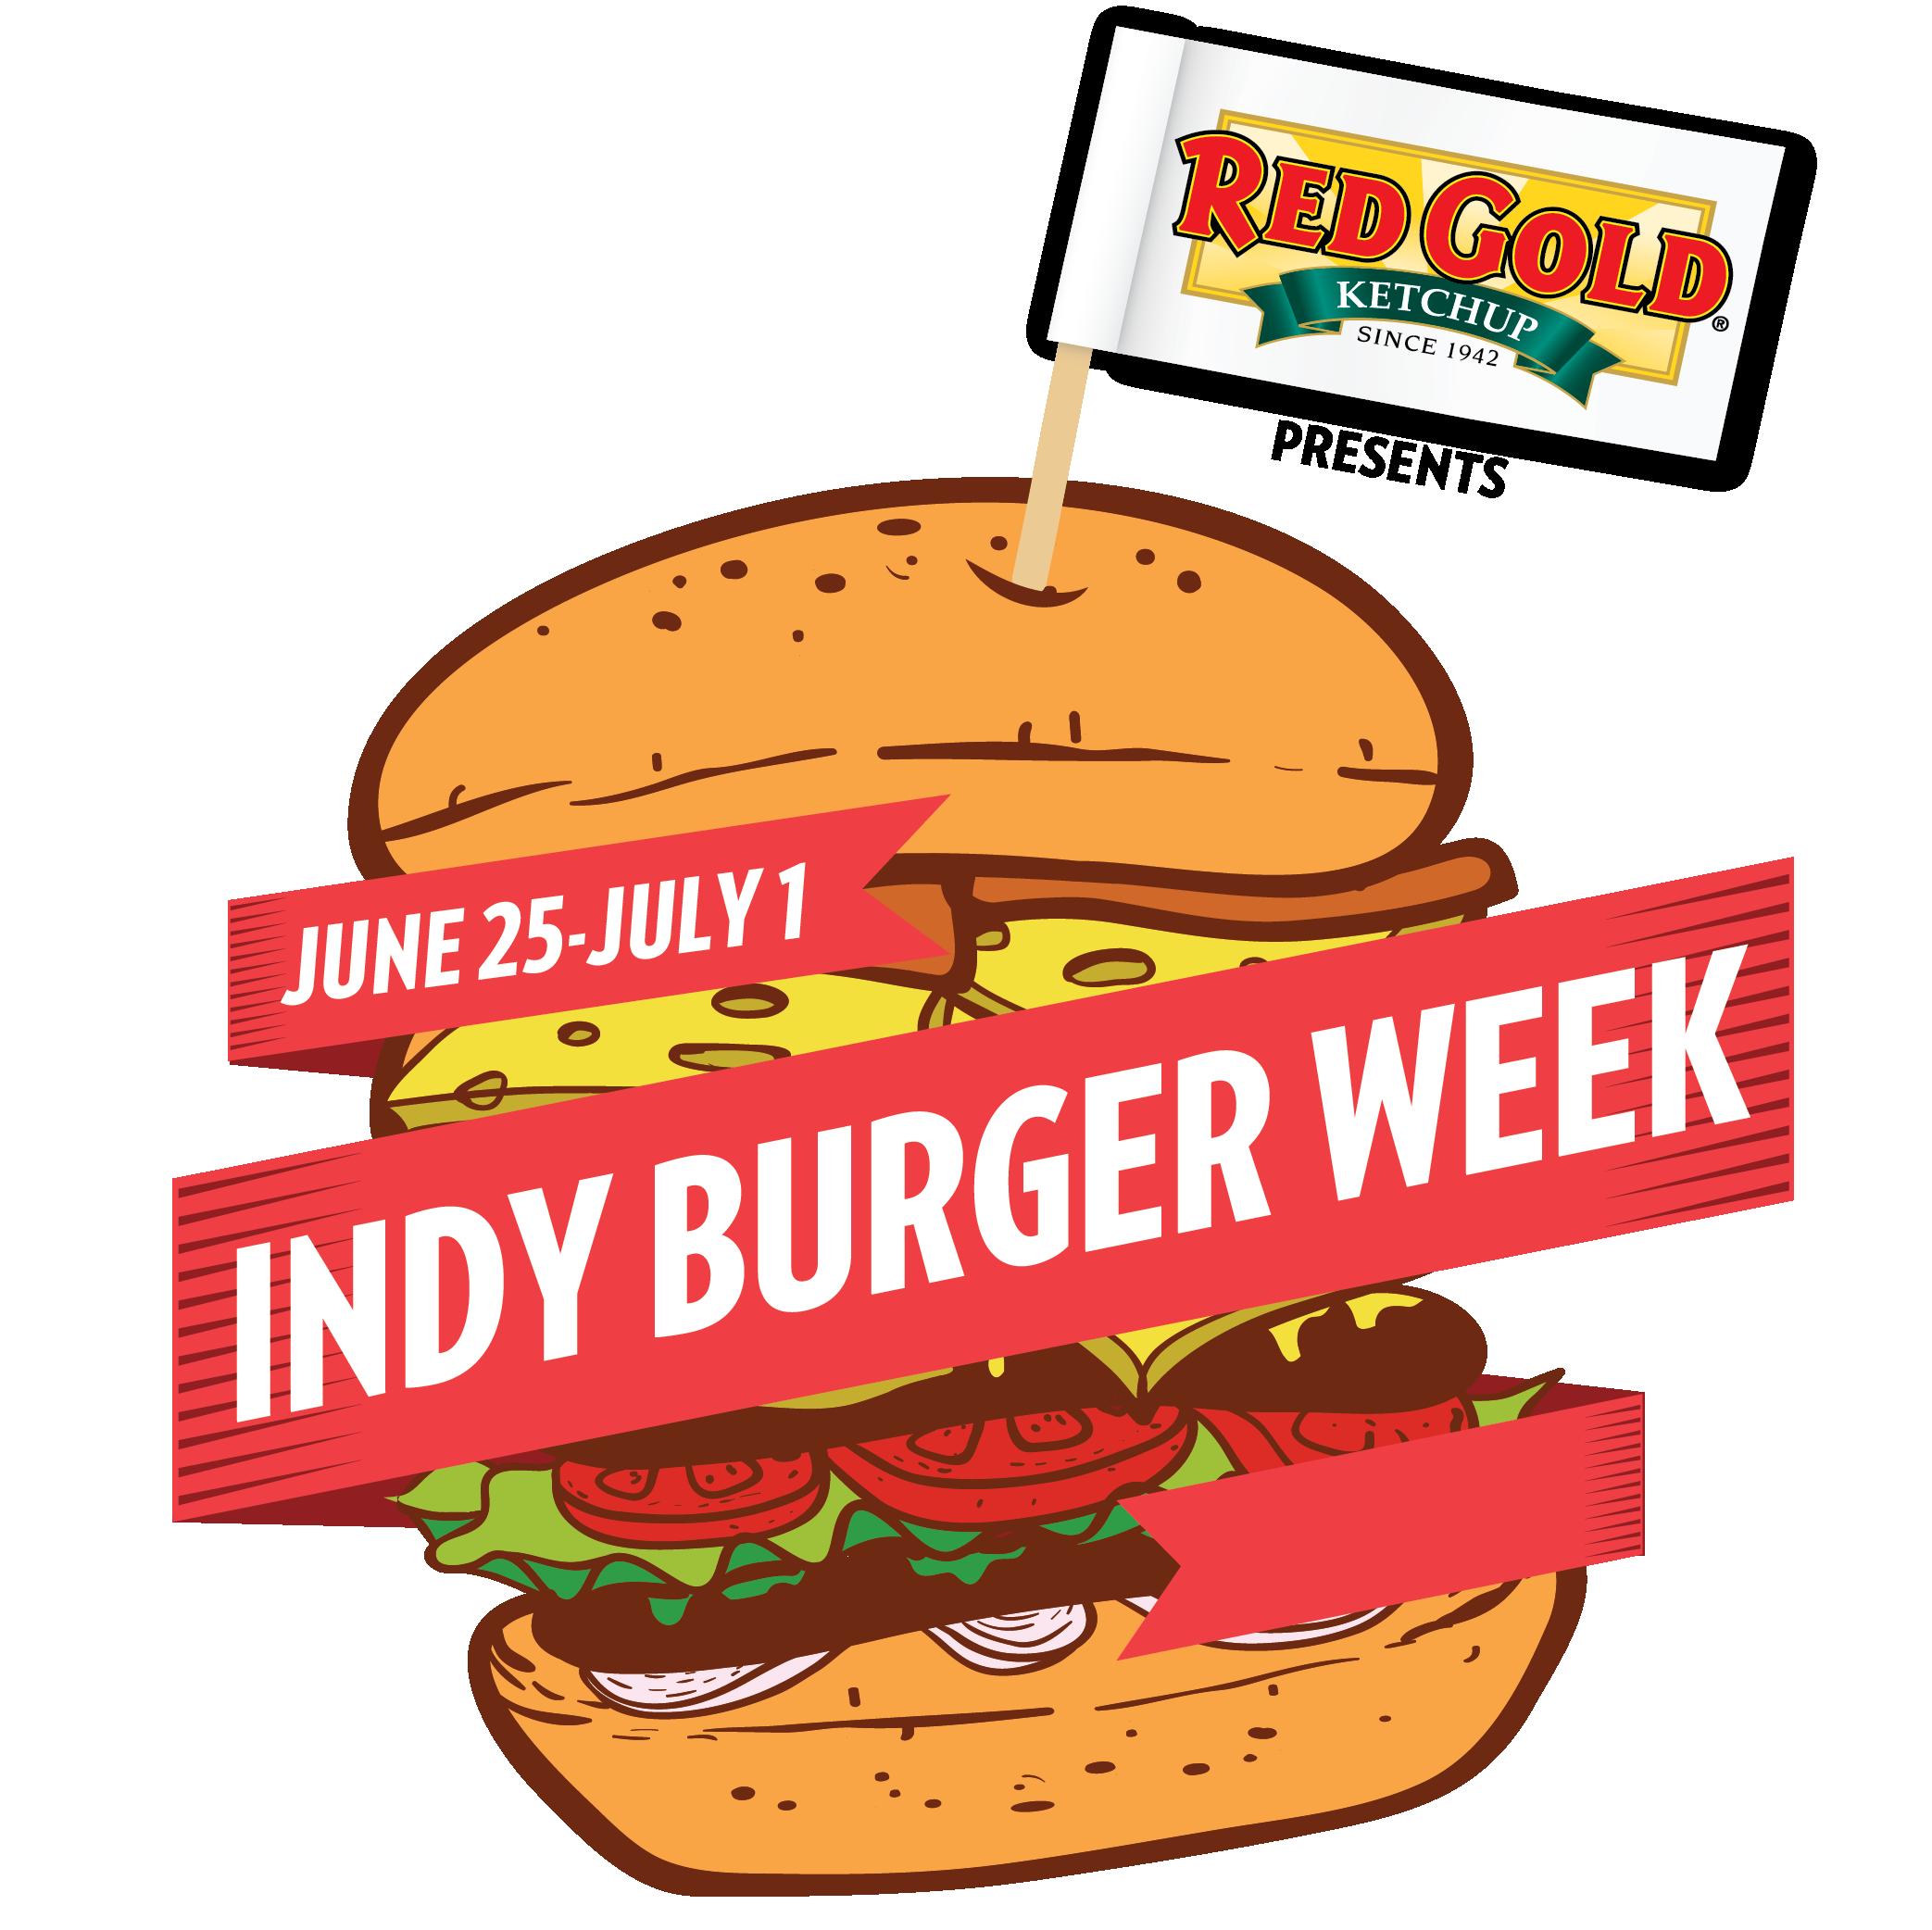 Indy burger week indyburgerweek. Hamburger clipart diner food